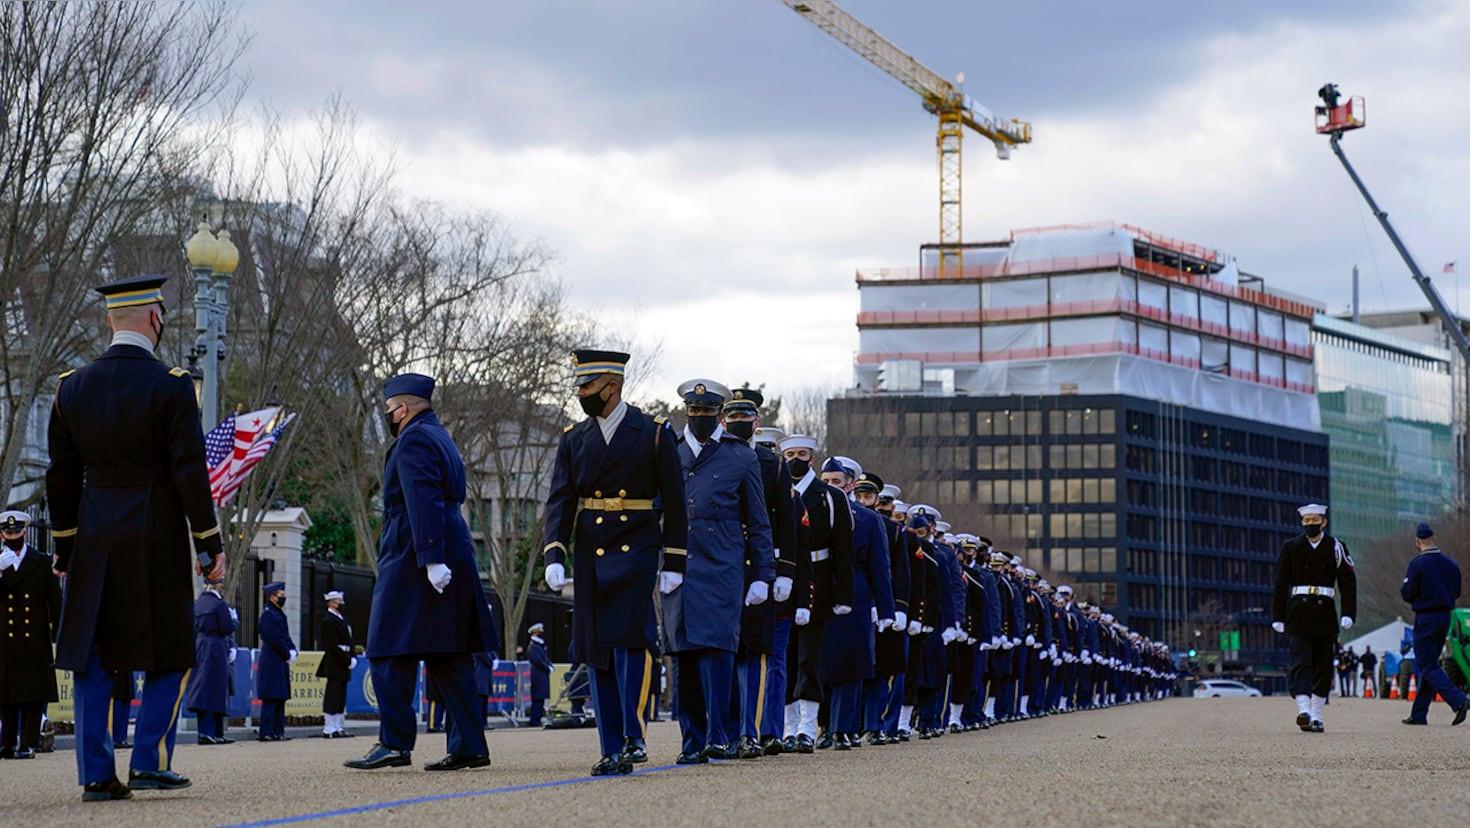 Military troops rehearse ahead of Joe Biden